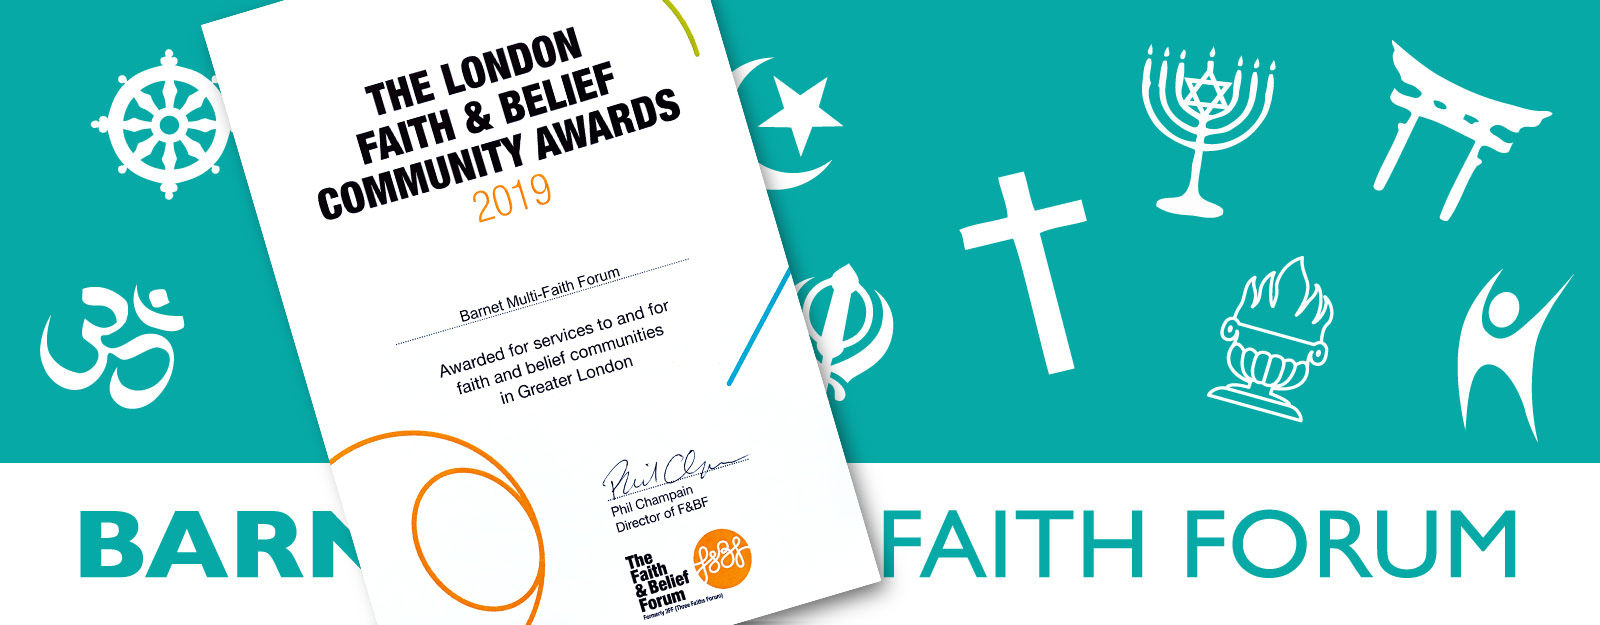 Barnet Multi Faith Forum recognised in the London Faith & Belief Community Awards